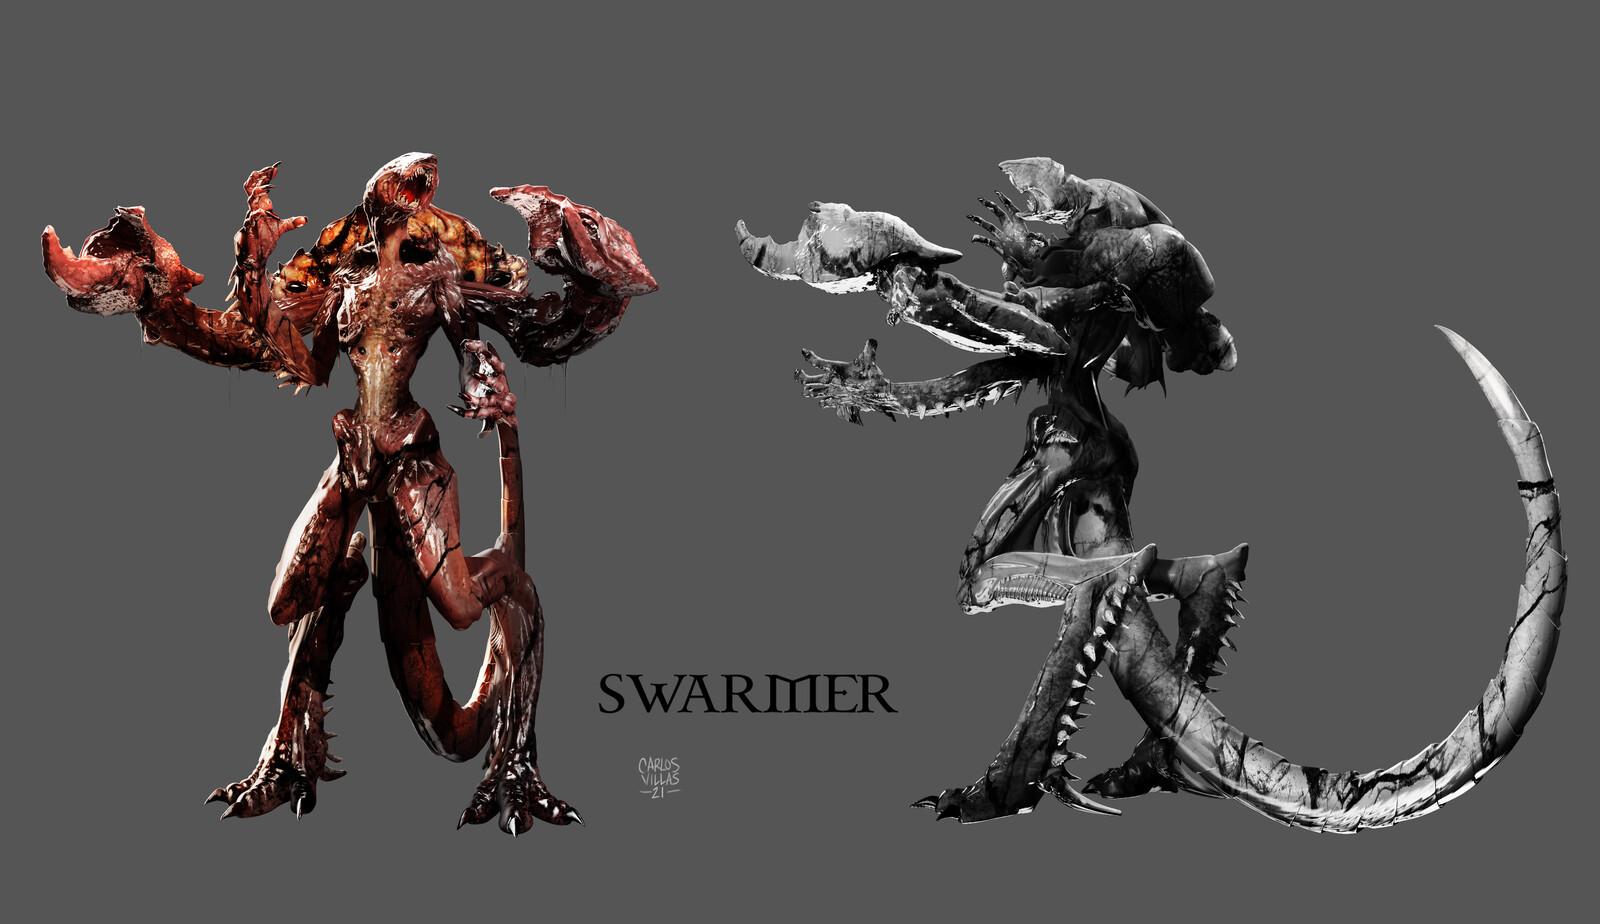 SWARMER - CONCEPT ART